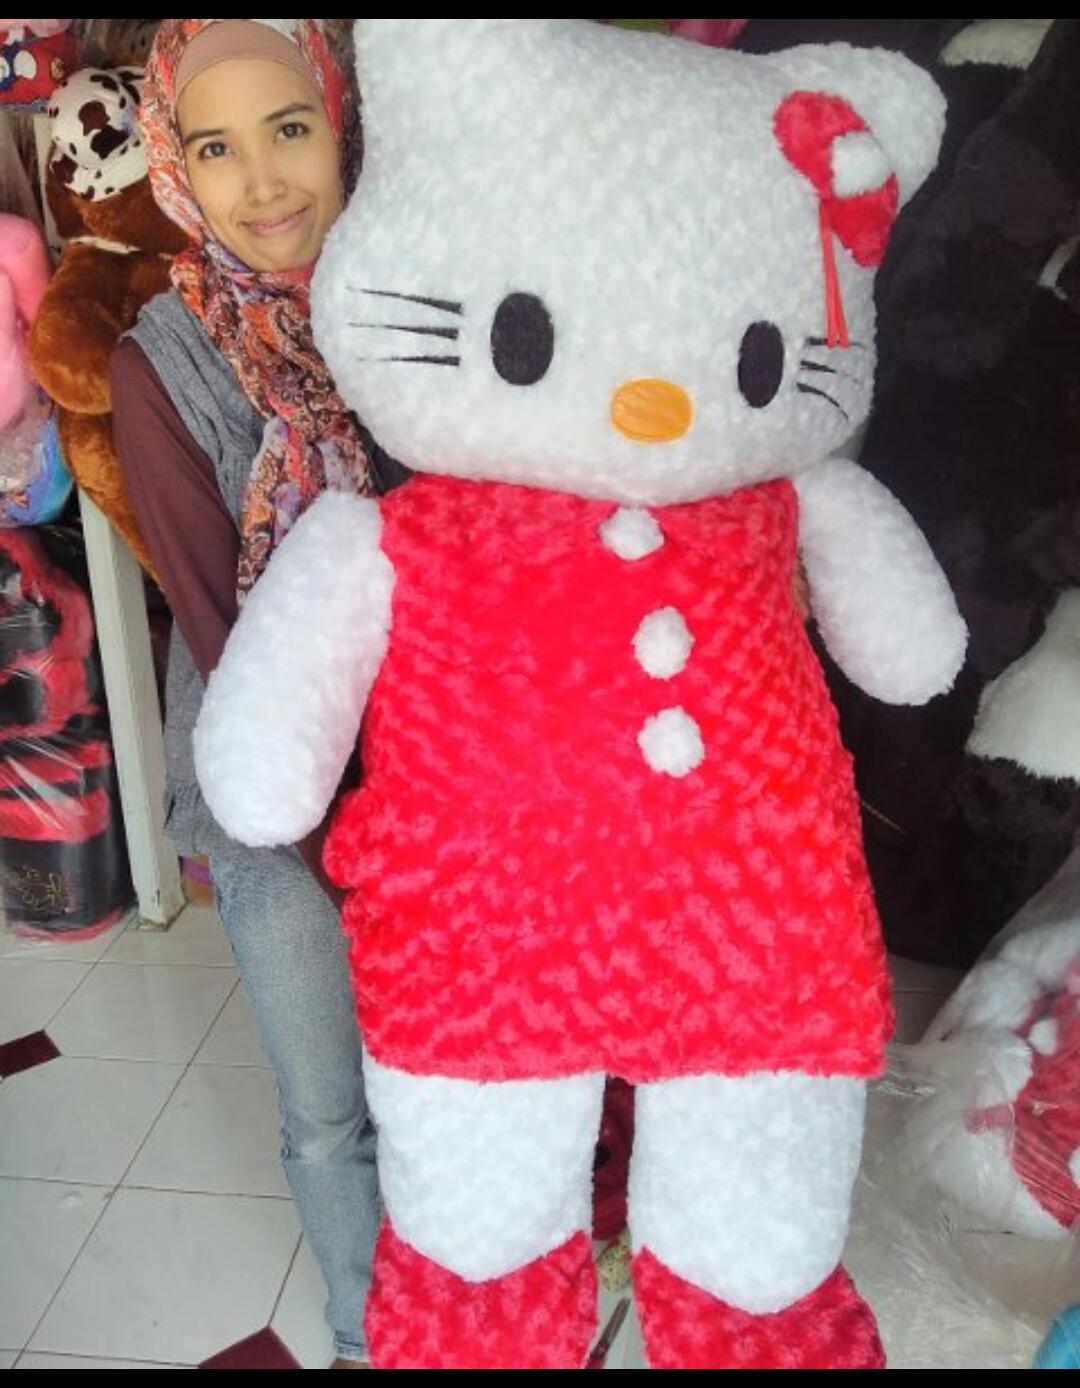 Fitur Boneka Hello Kitty Rok Super Jumbo 1m Dan Harga Terbaru 1 2